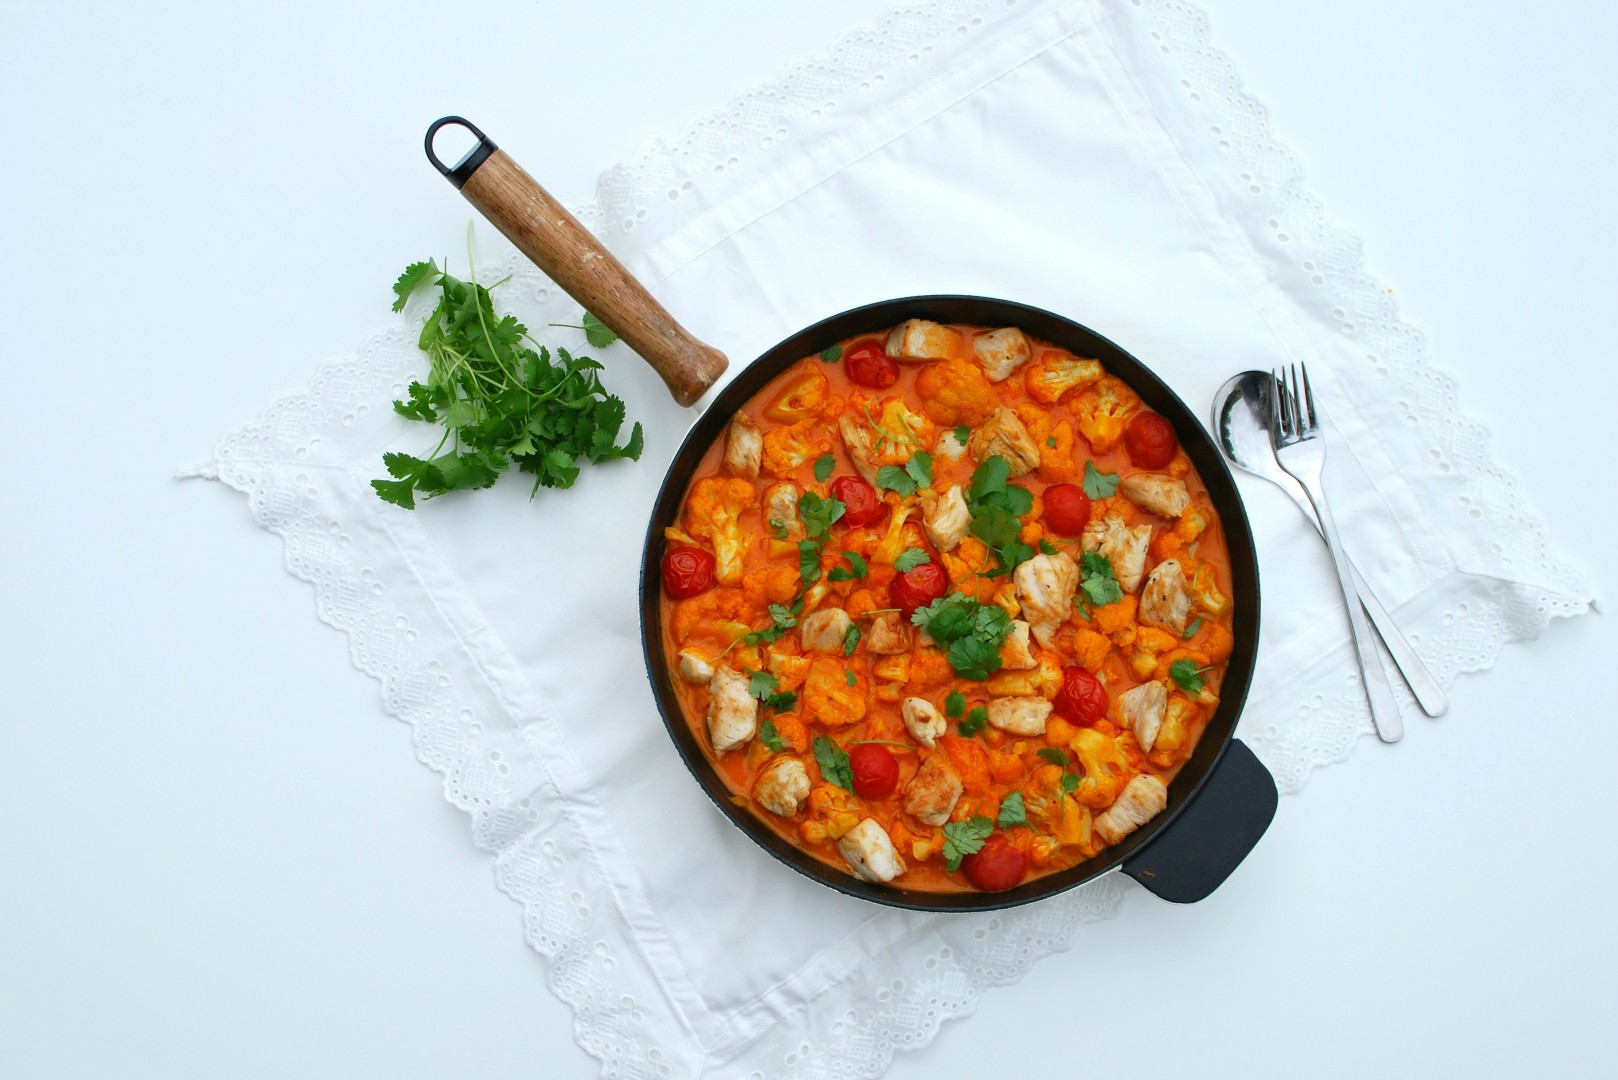 Curry van bloemkool met kip - www.truitjeroermeniet.be